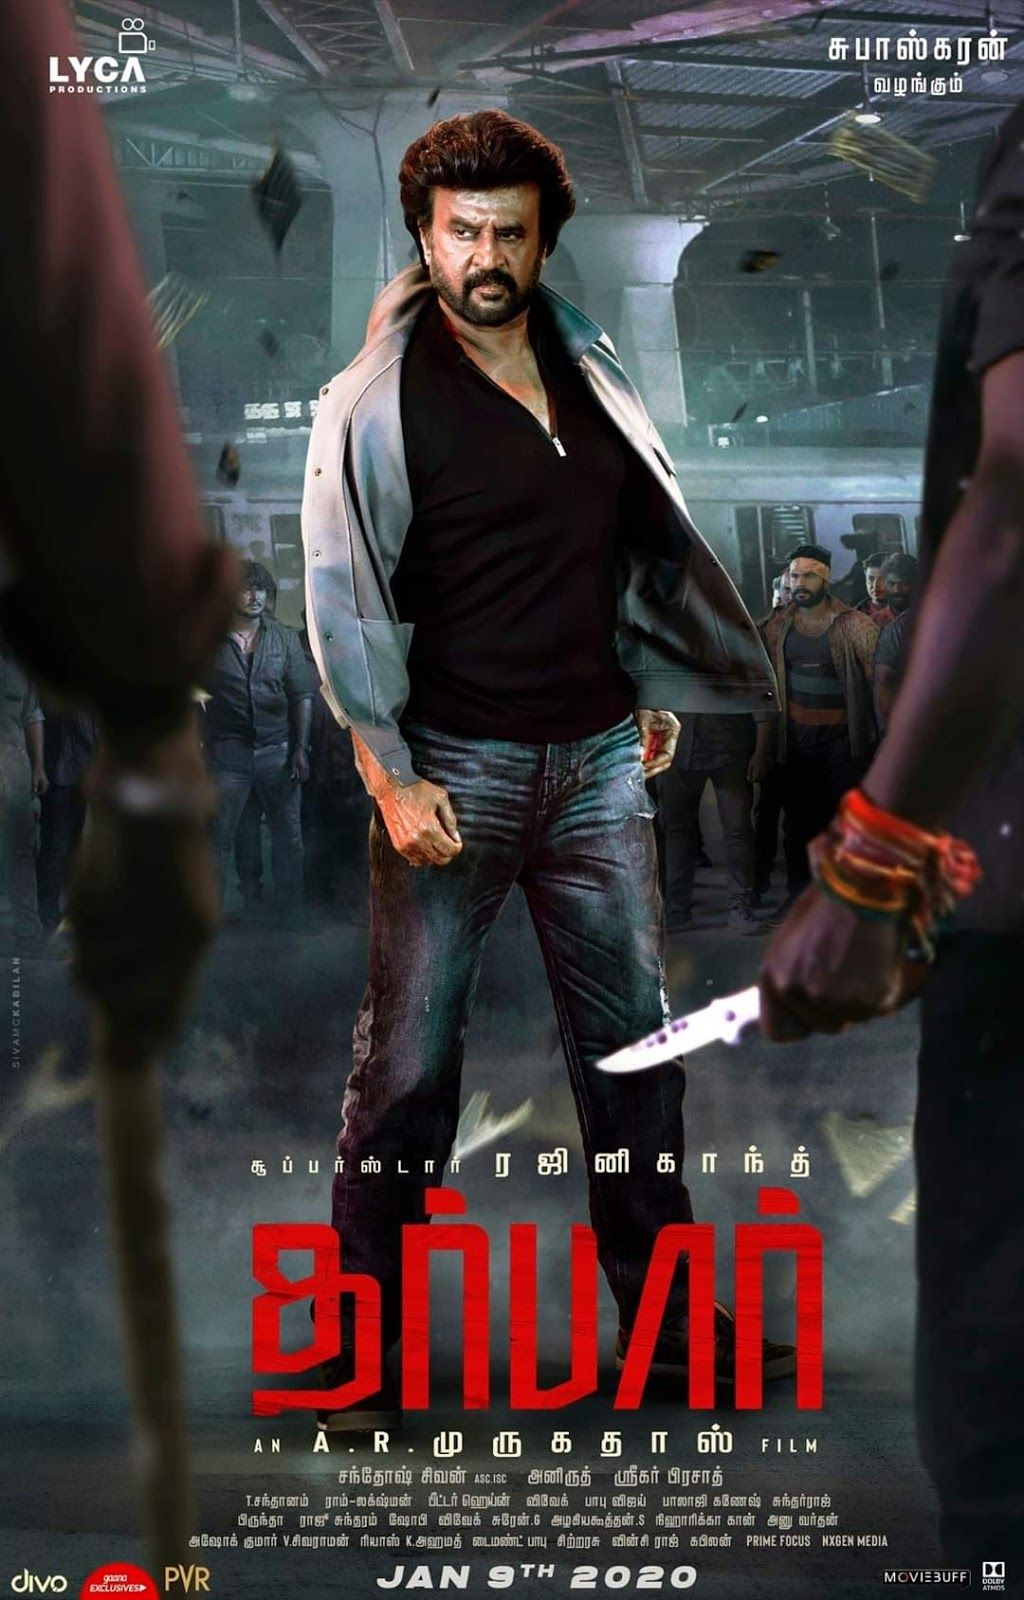 New Poster Of Superstar Rajnikanth Darbar In 2020 New Hindi Movie Latest Hindi Movies Hindi Movies Online